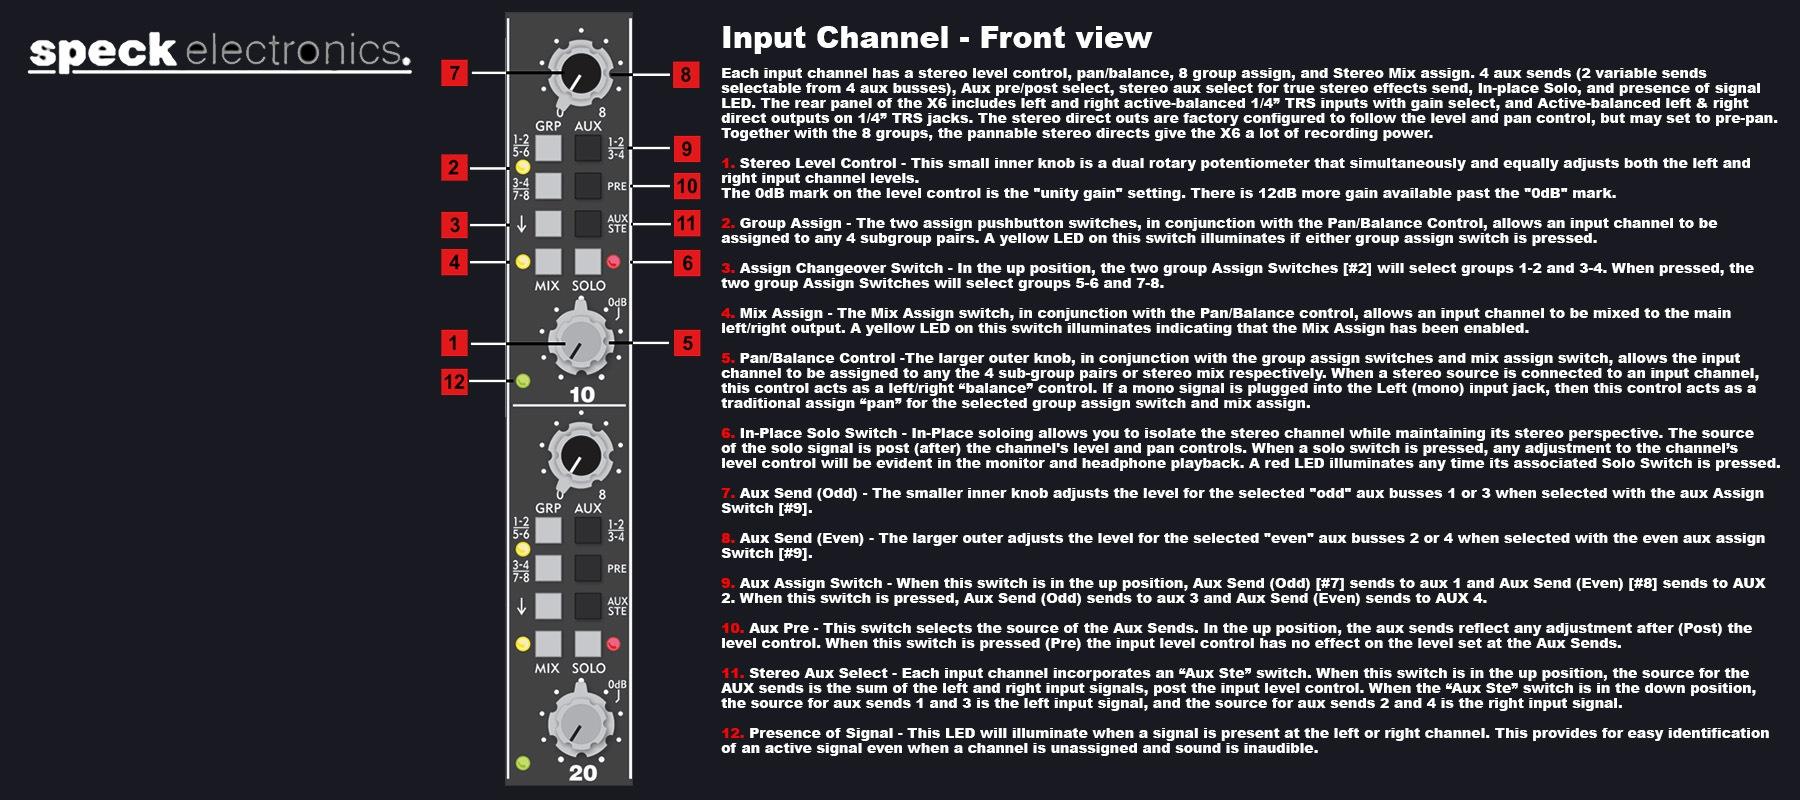 Speck Electronics Xtramix X6 - Input channel